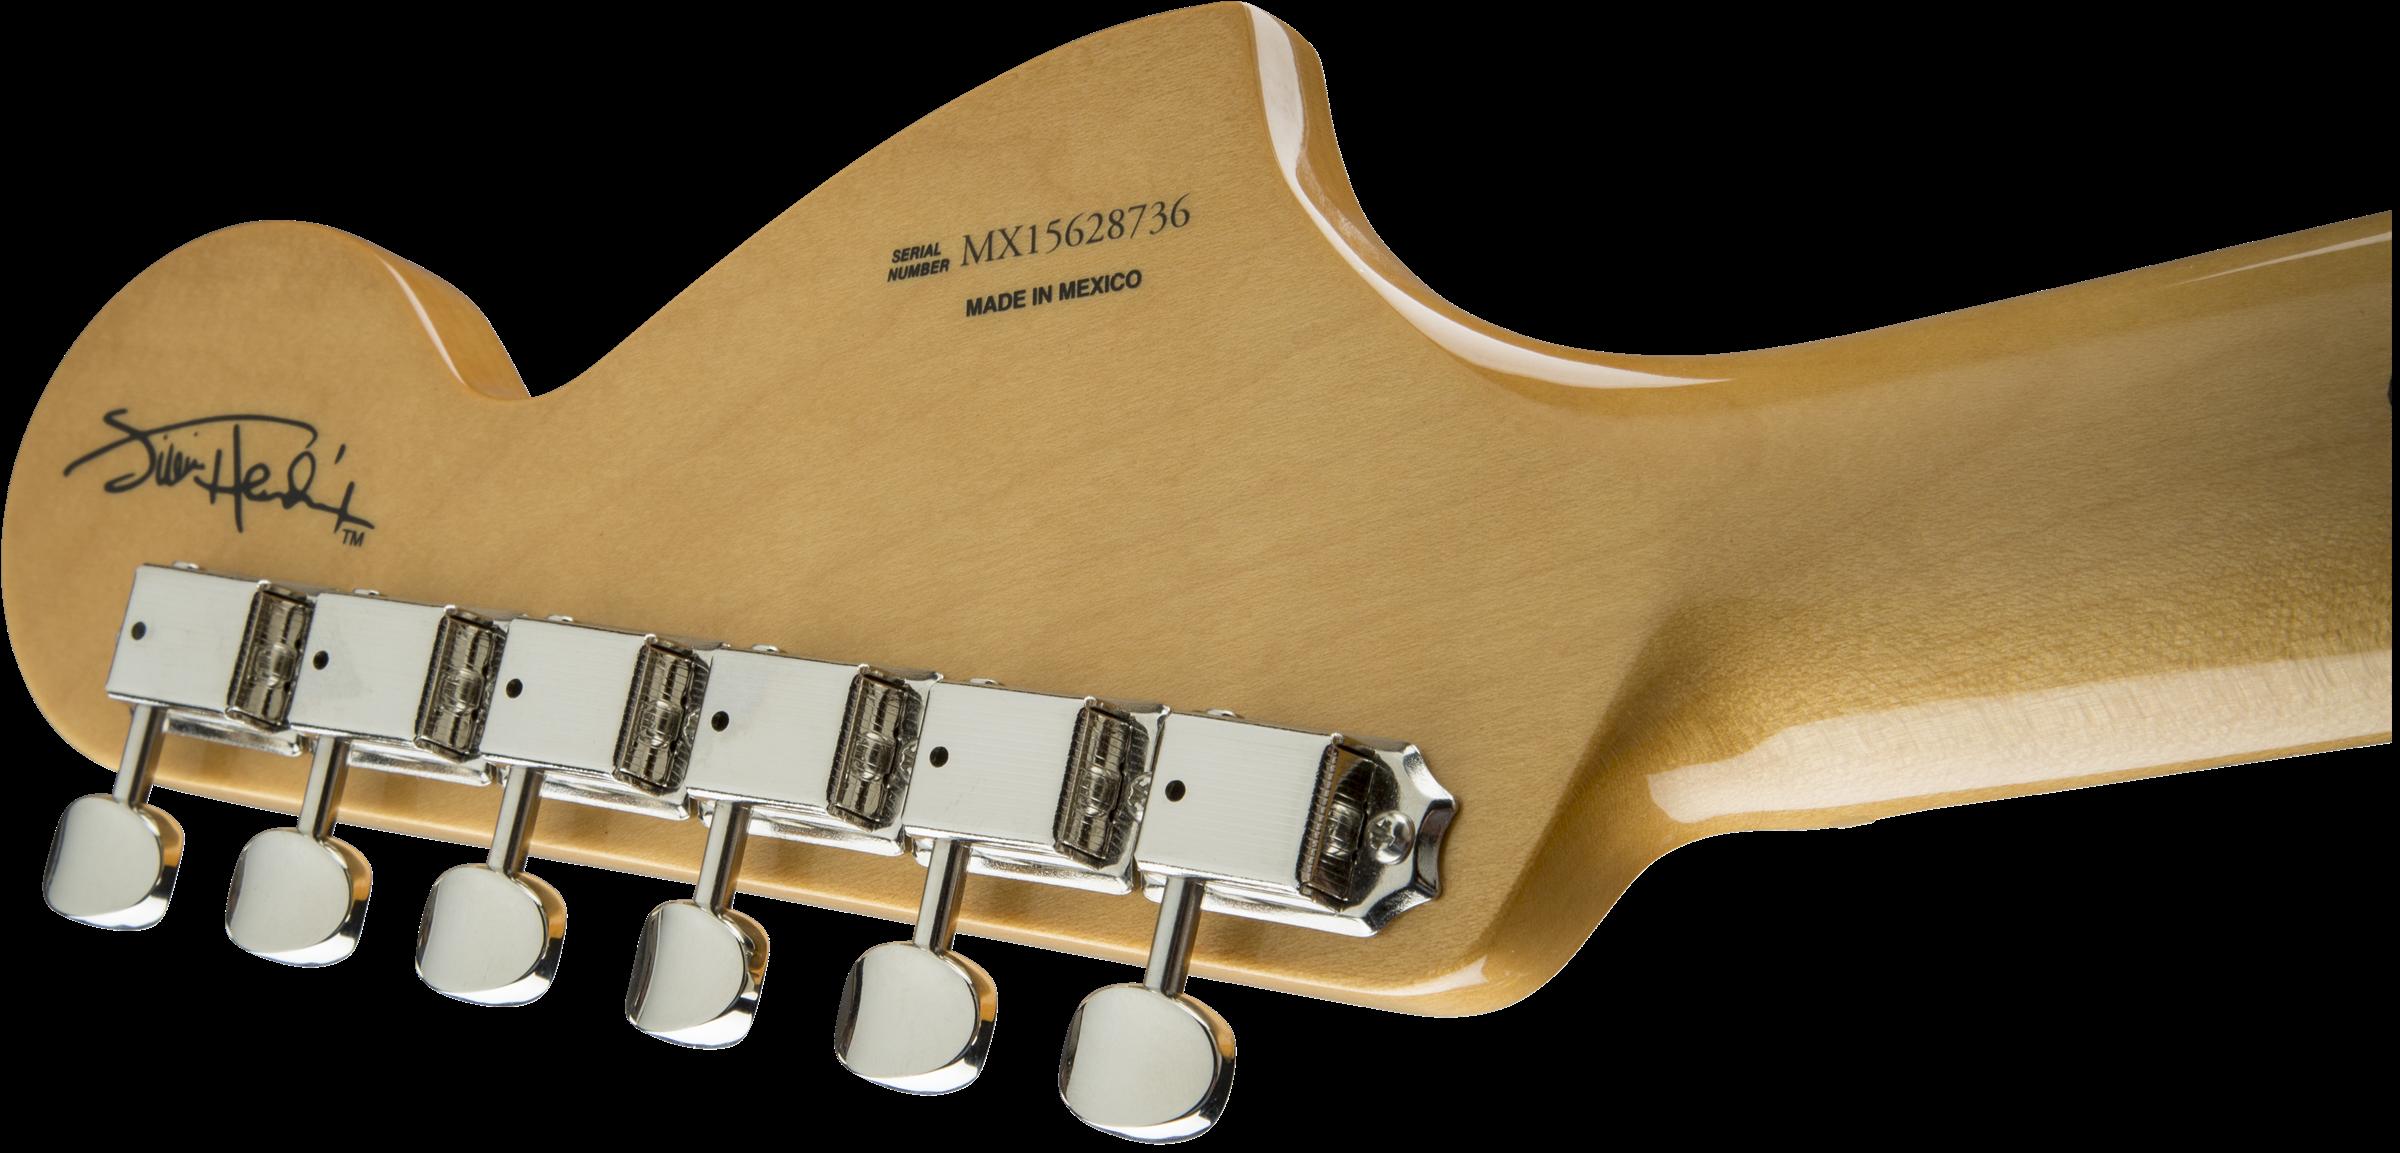 FENDER:  Jimi Hendrix Stratocaster